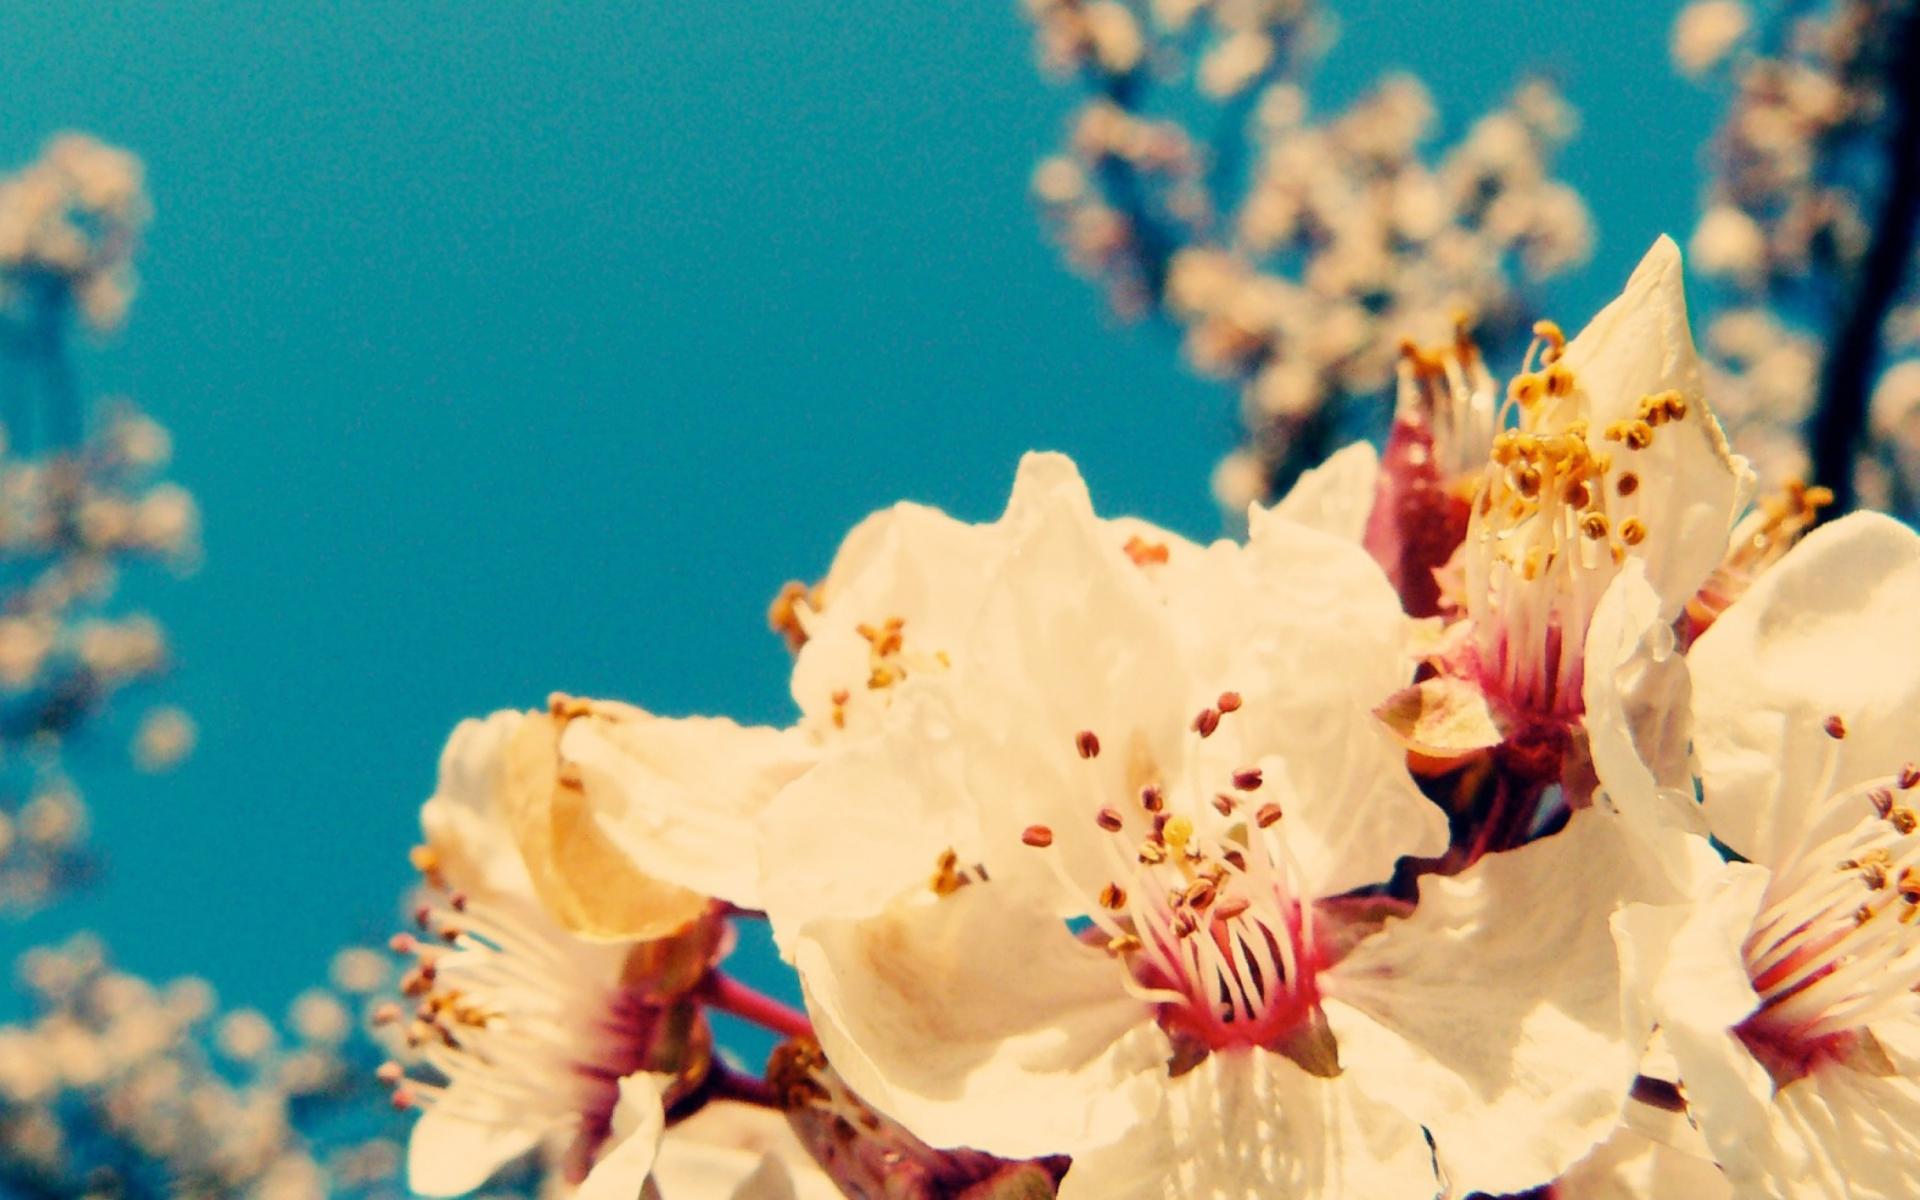 Cherry vintage flowers fondos de pantalla gratis para for Imagenes full hd para fondo de pantalla